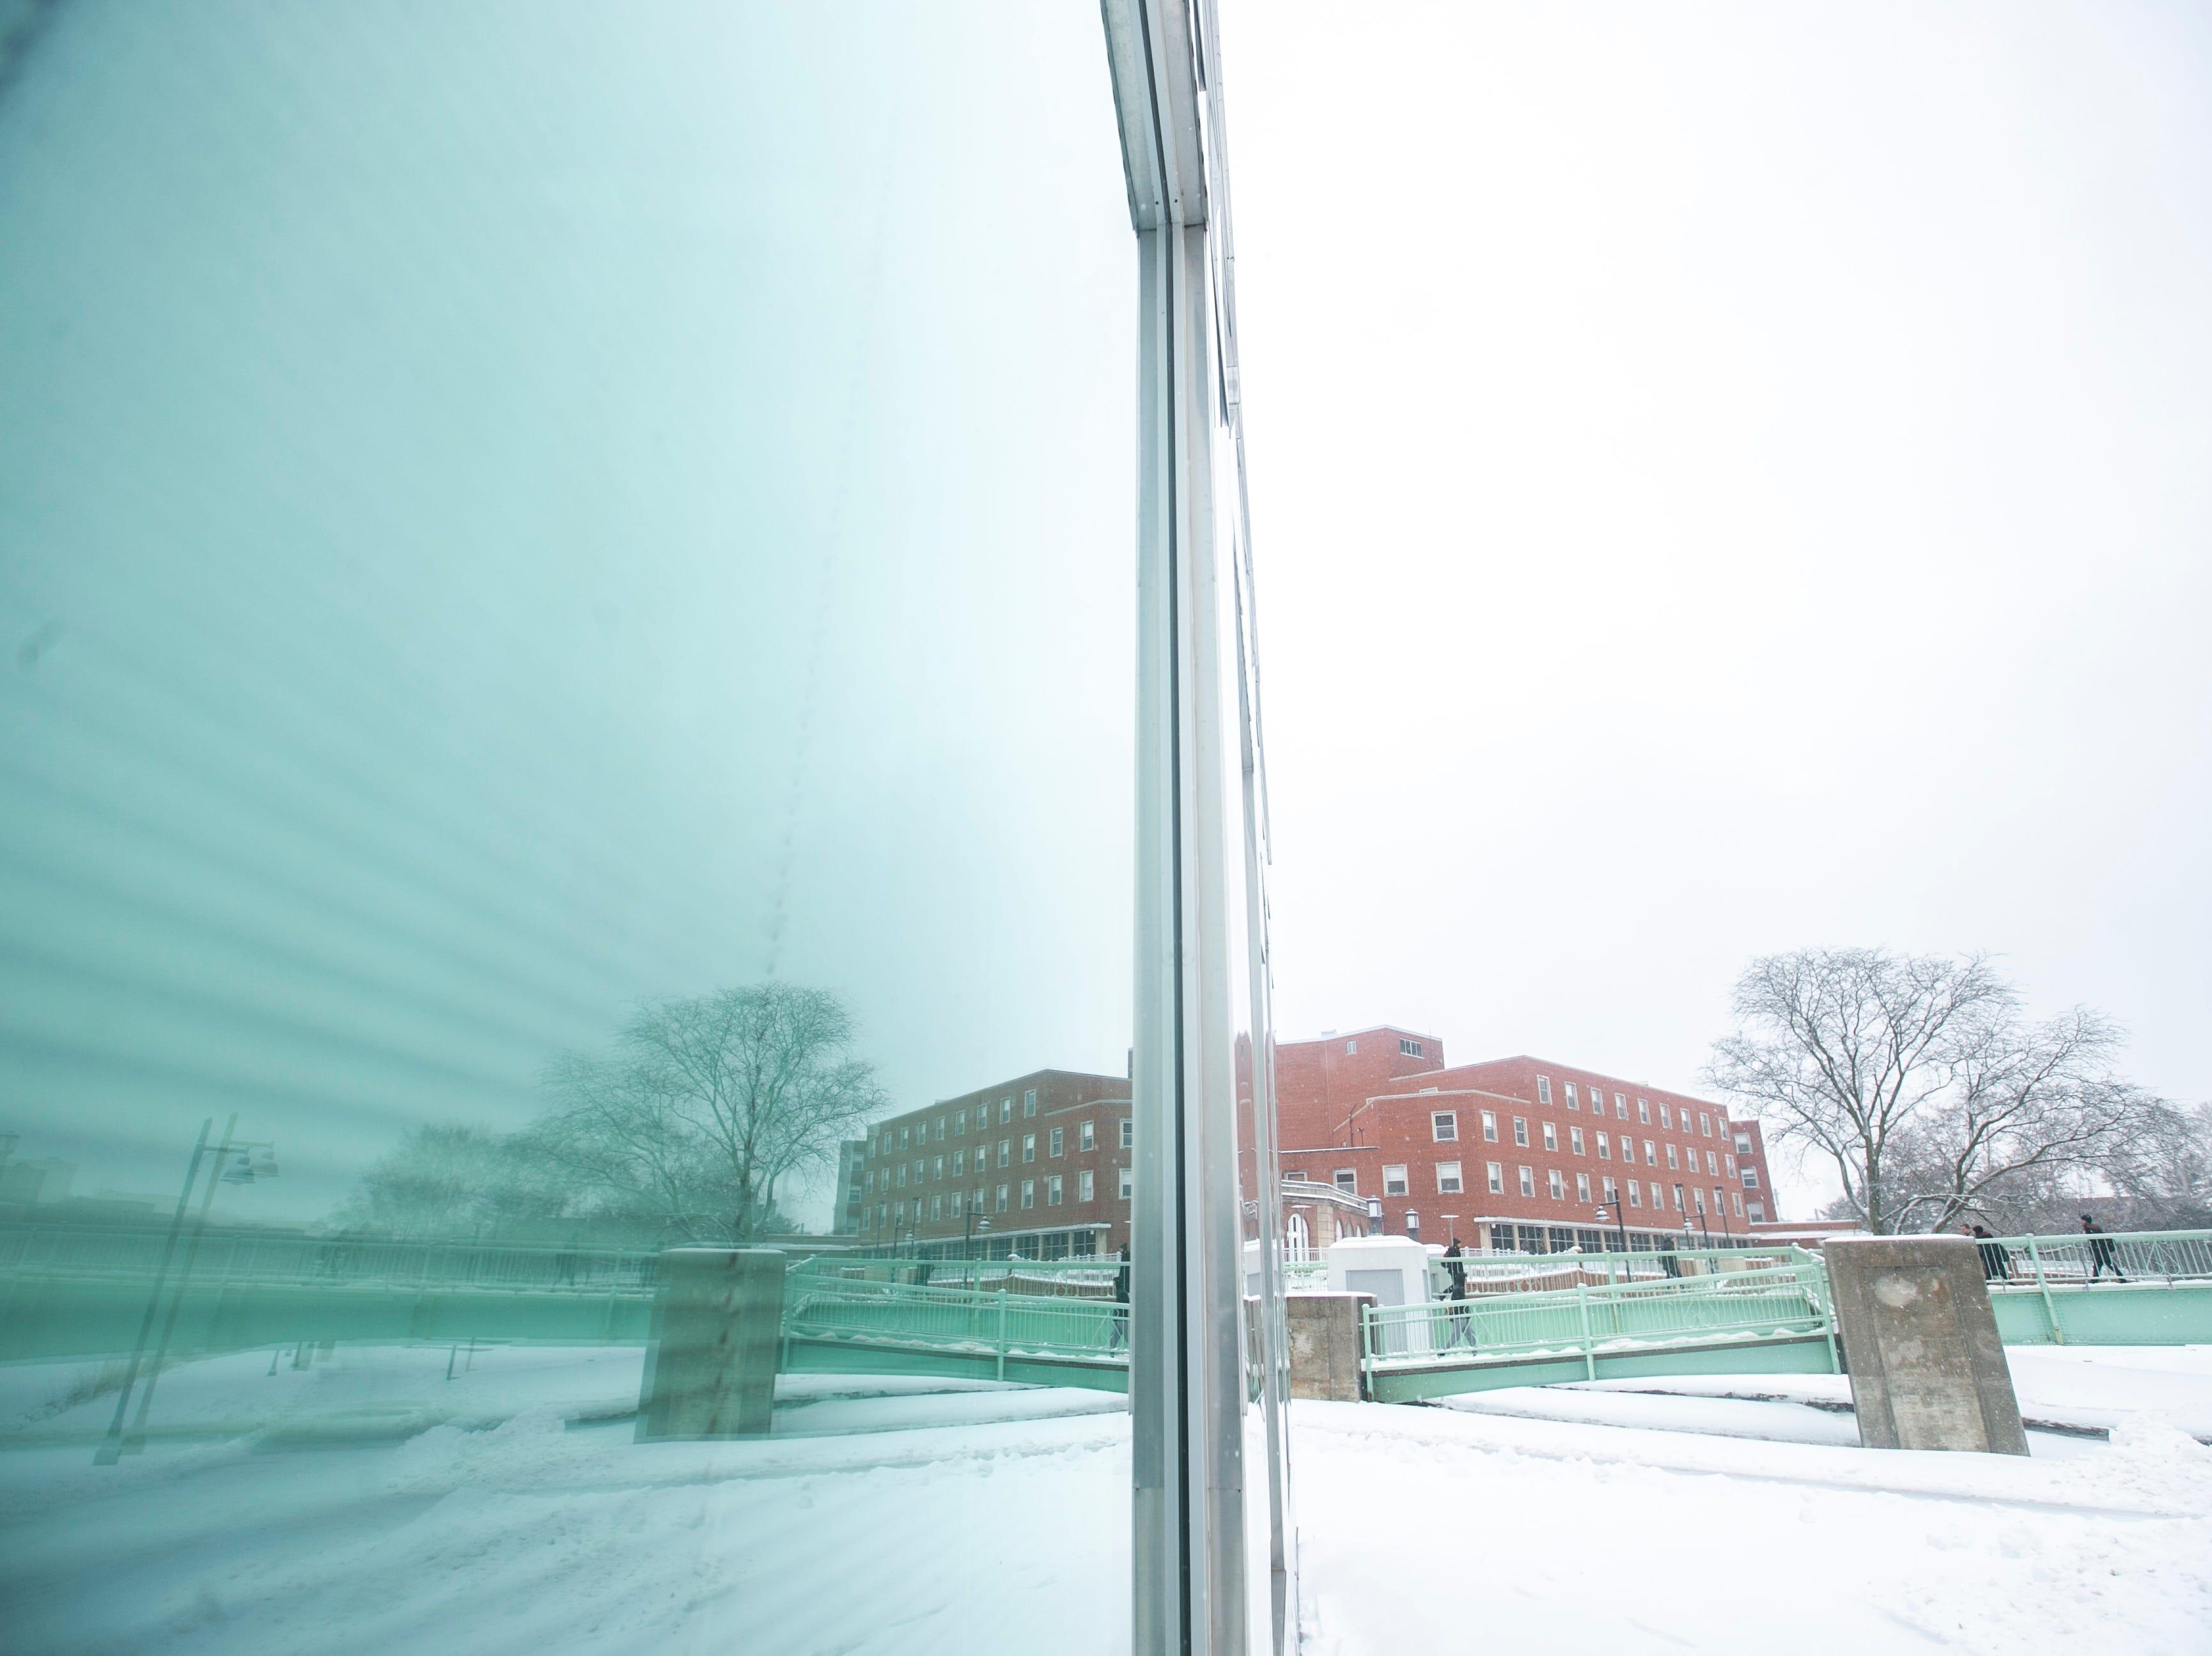 The Iowa Memorial Union bridge is reflected in a window of the Iowa Advanced Technology Laboratories building as light snow falls on Tuesday, Jan. 22, 2019, in Iowa City, Iowa.